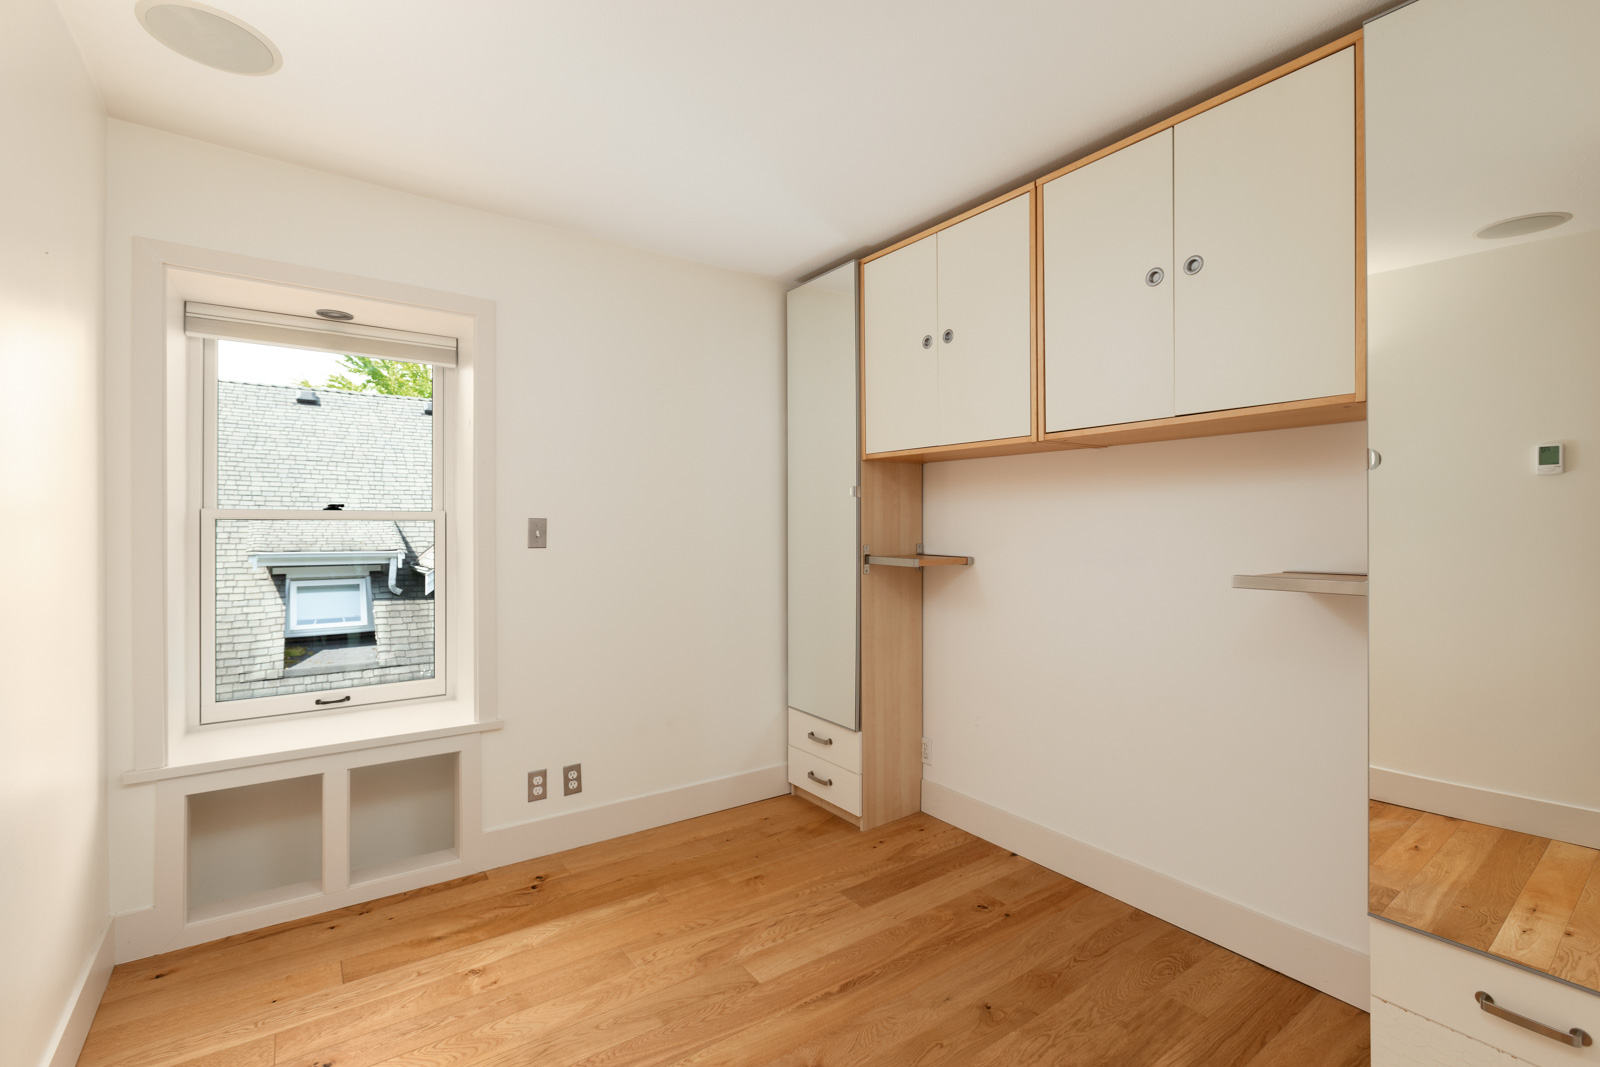 bedroom with plenty of storage cabinets